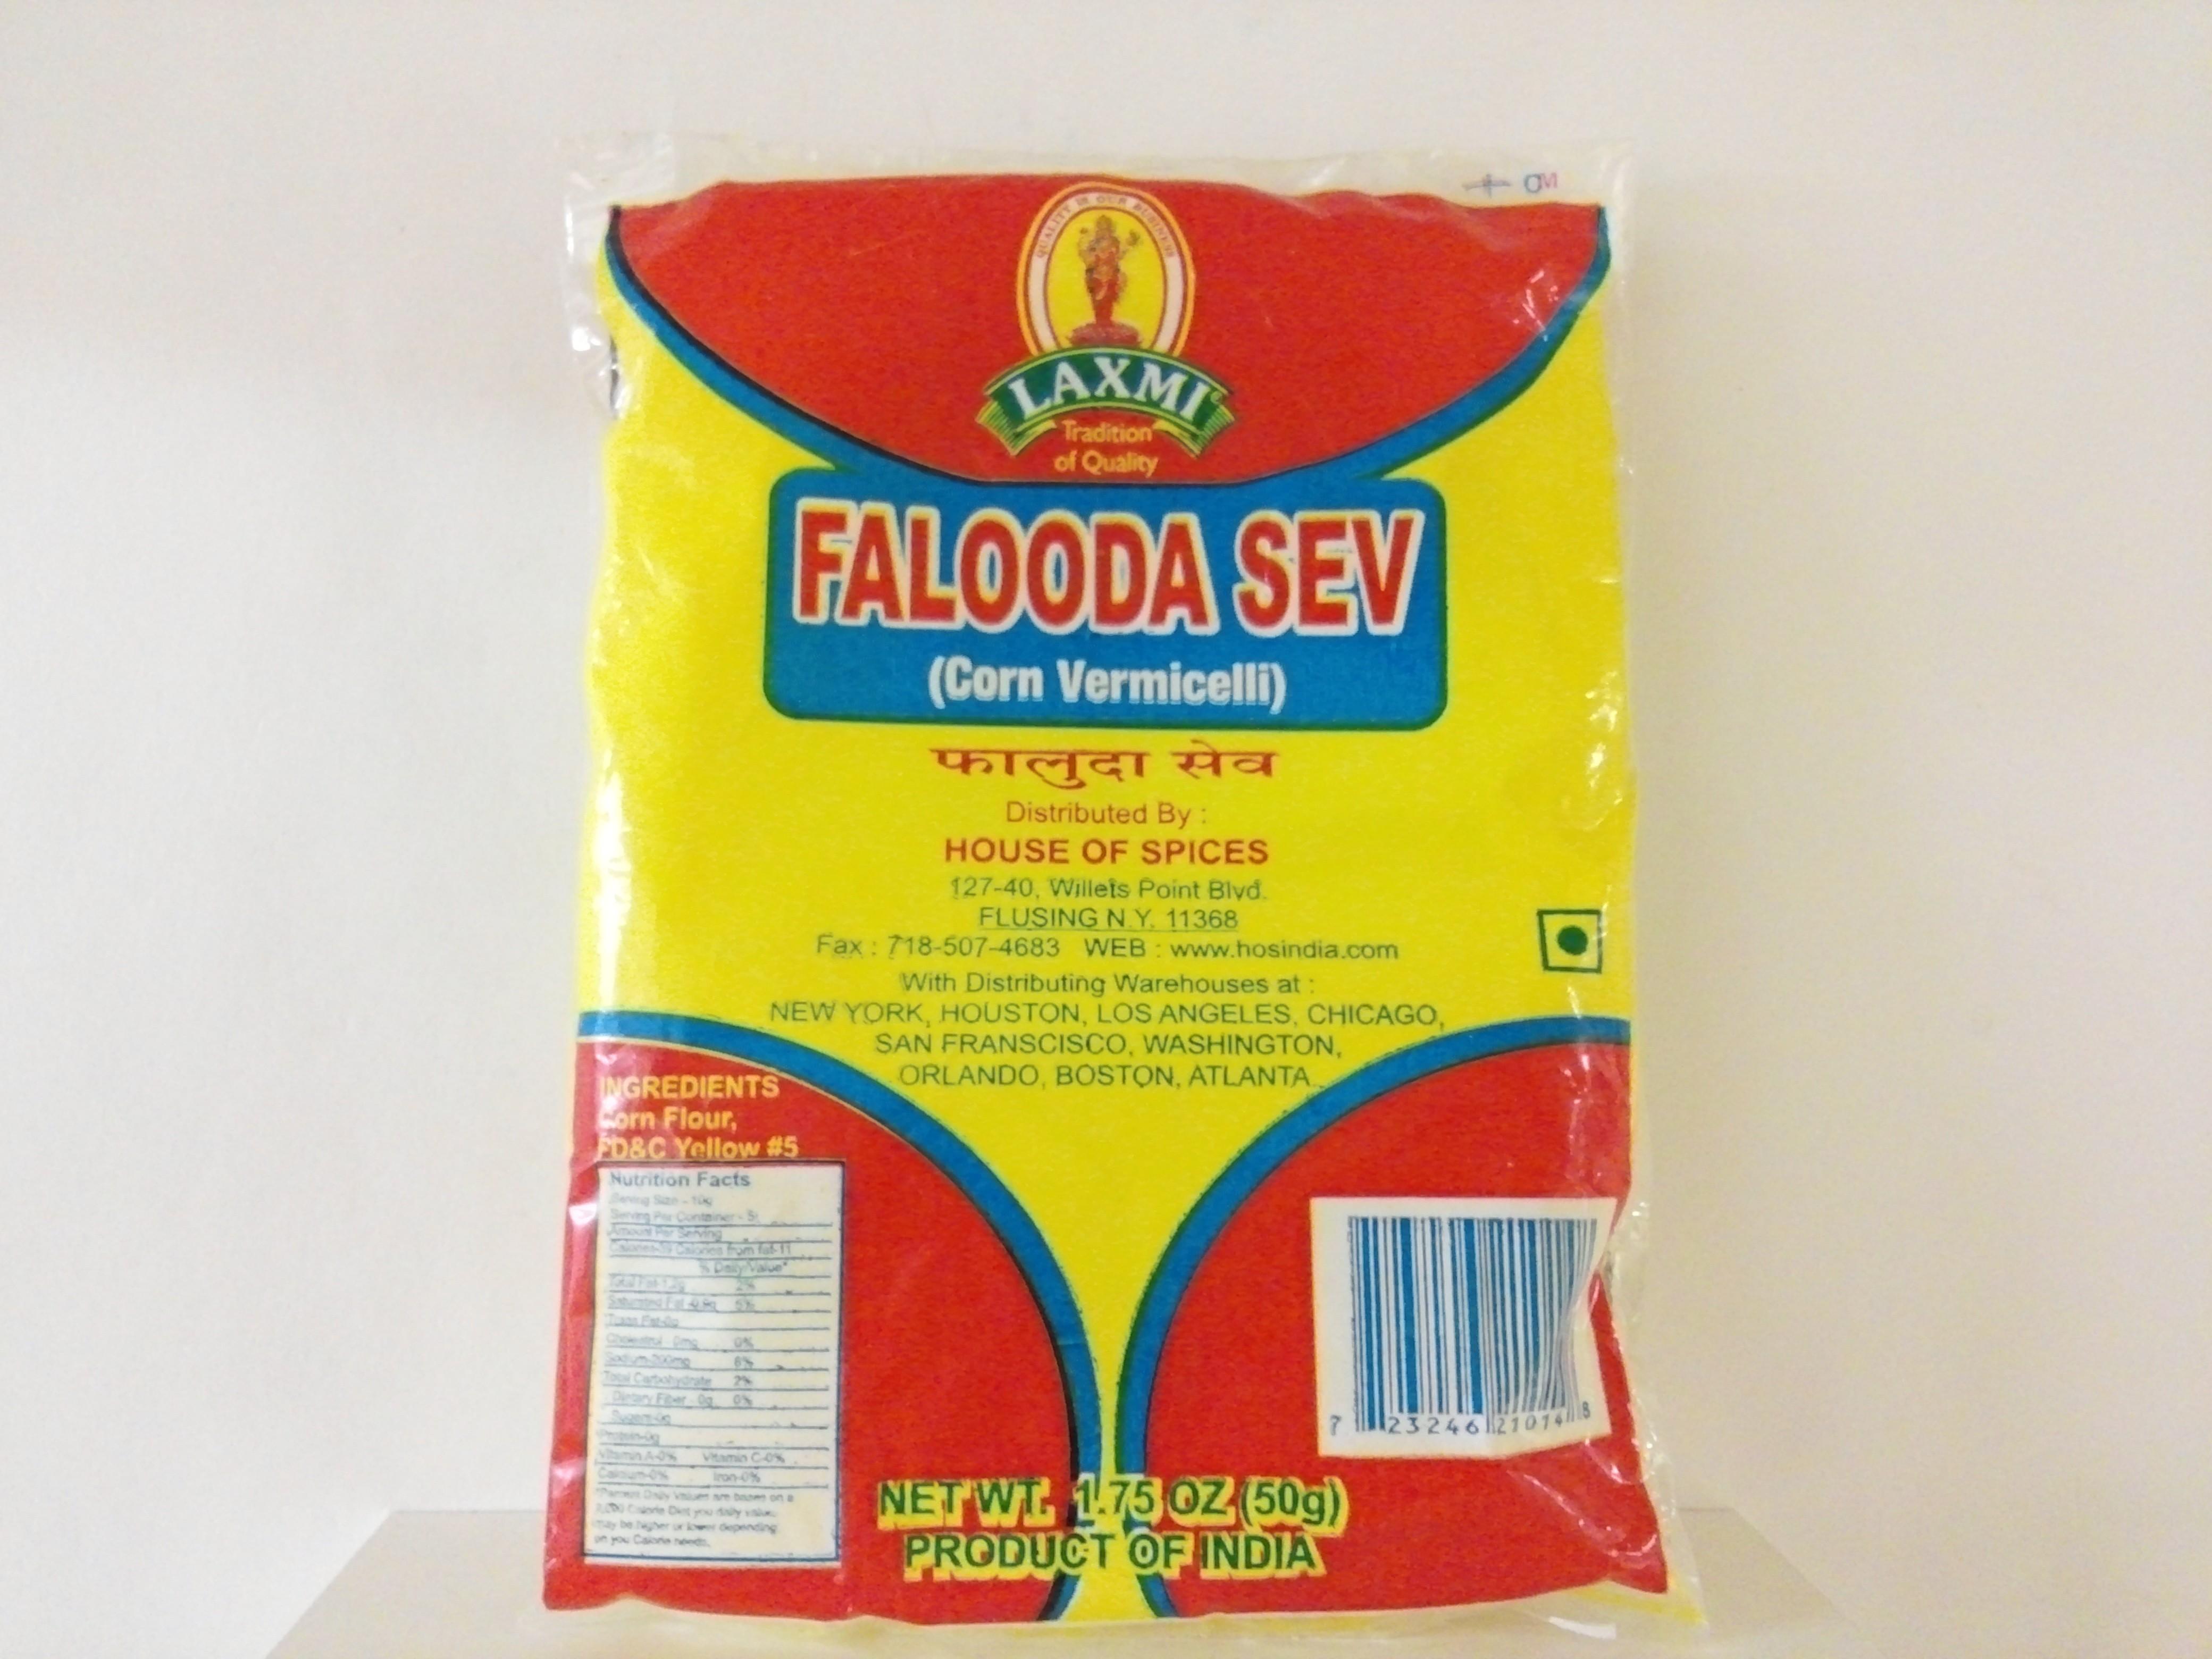 Falooda Sev 1.75 oz